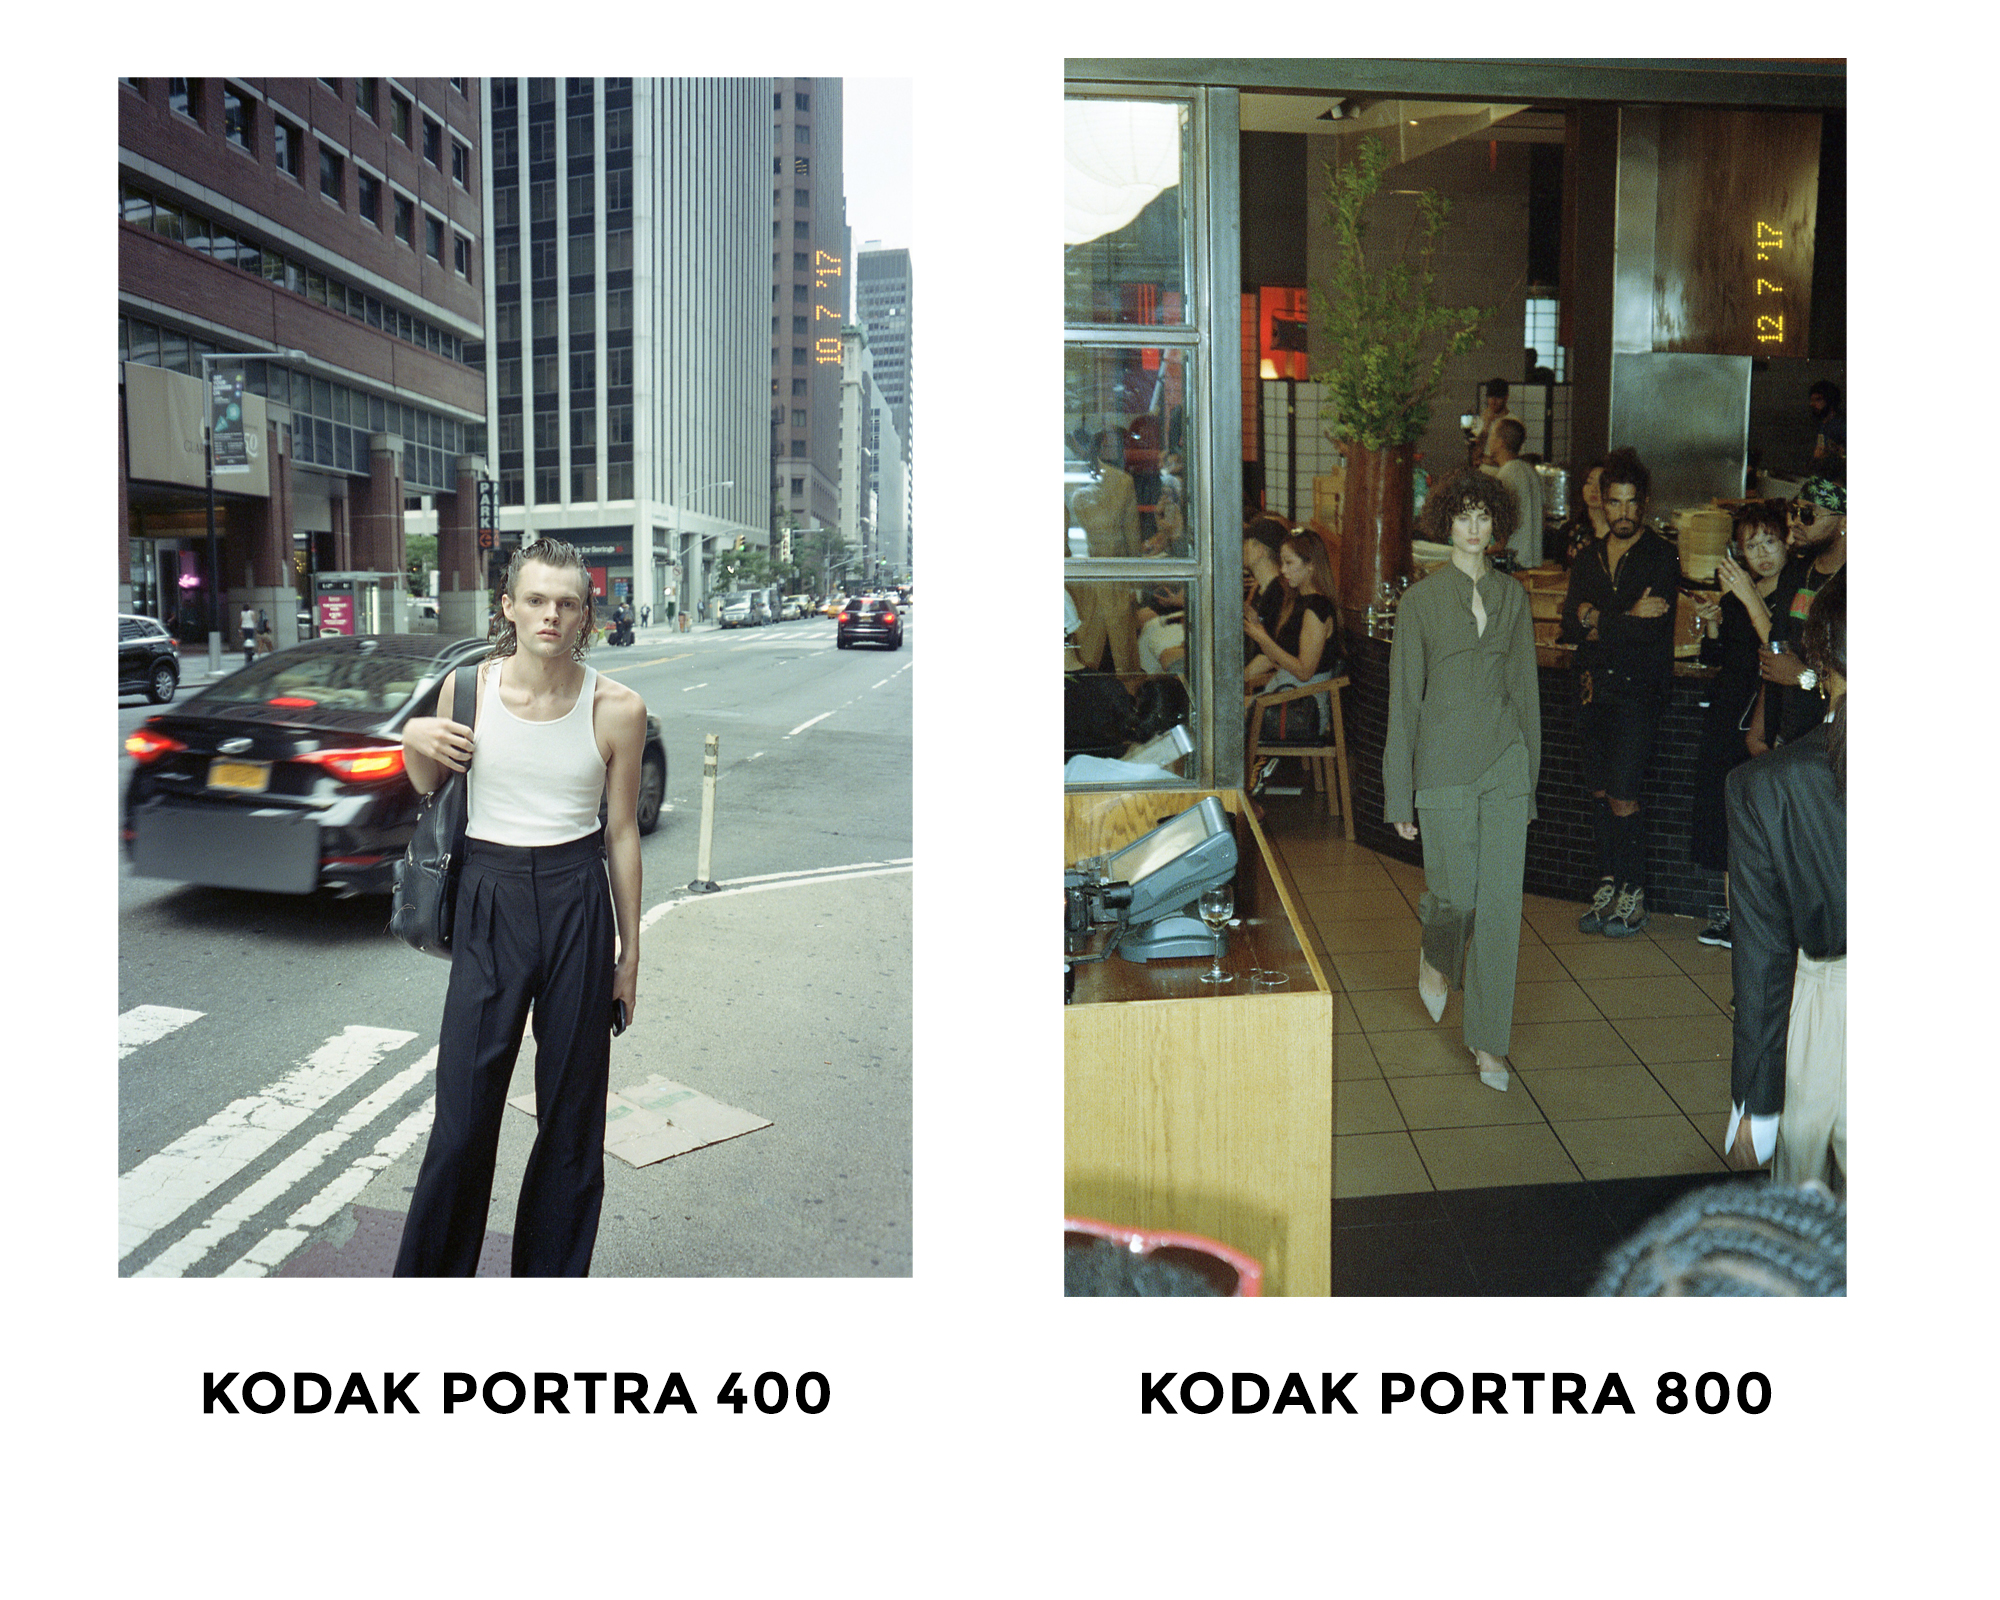 4 - Kodak Portra 400 vs. Kodak PortrA 800 - FILTERGRADE BLOG